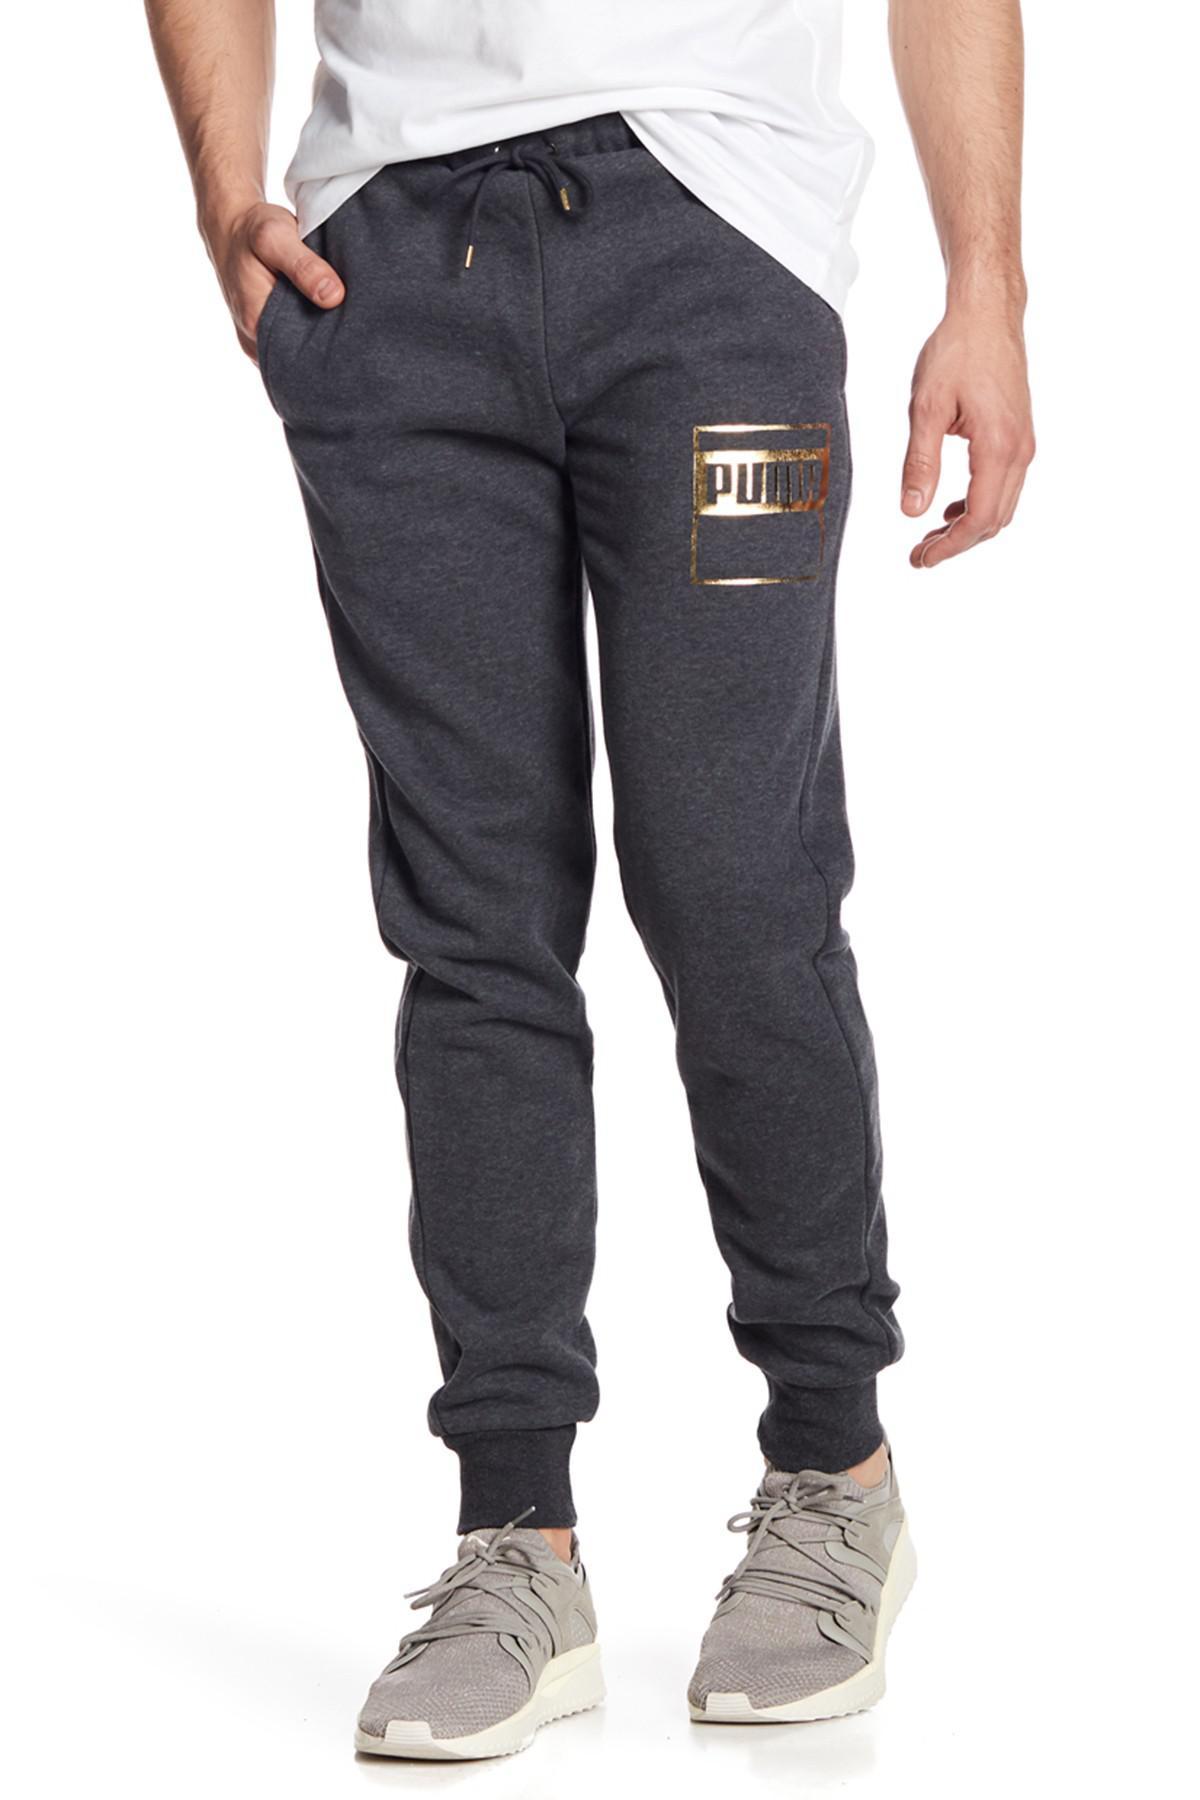 5ba5e3fc3700 ... Lyst - Puma Rebel Gold Logo Pants in Gray for Men ...